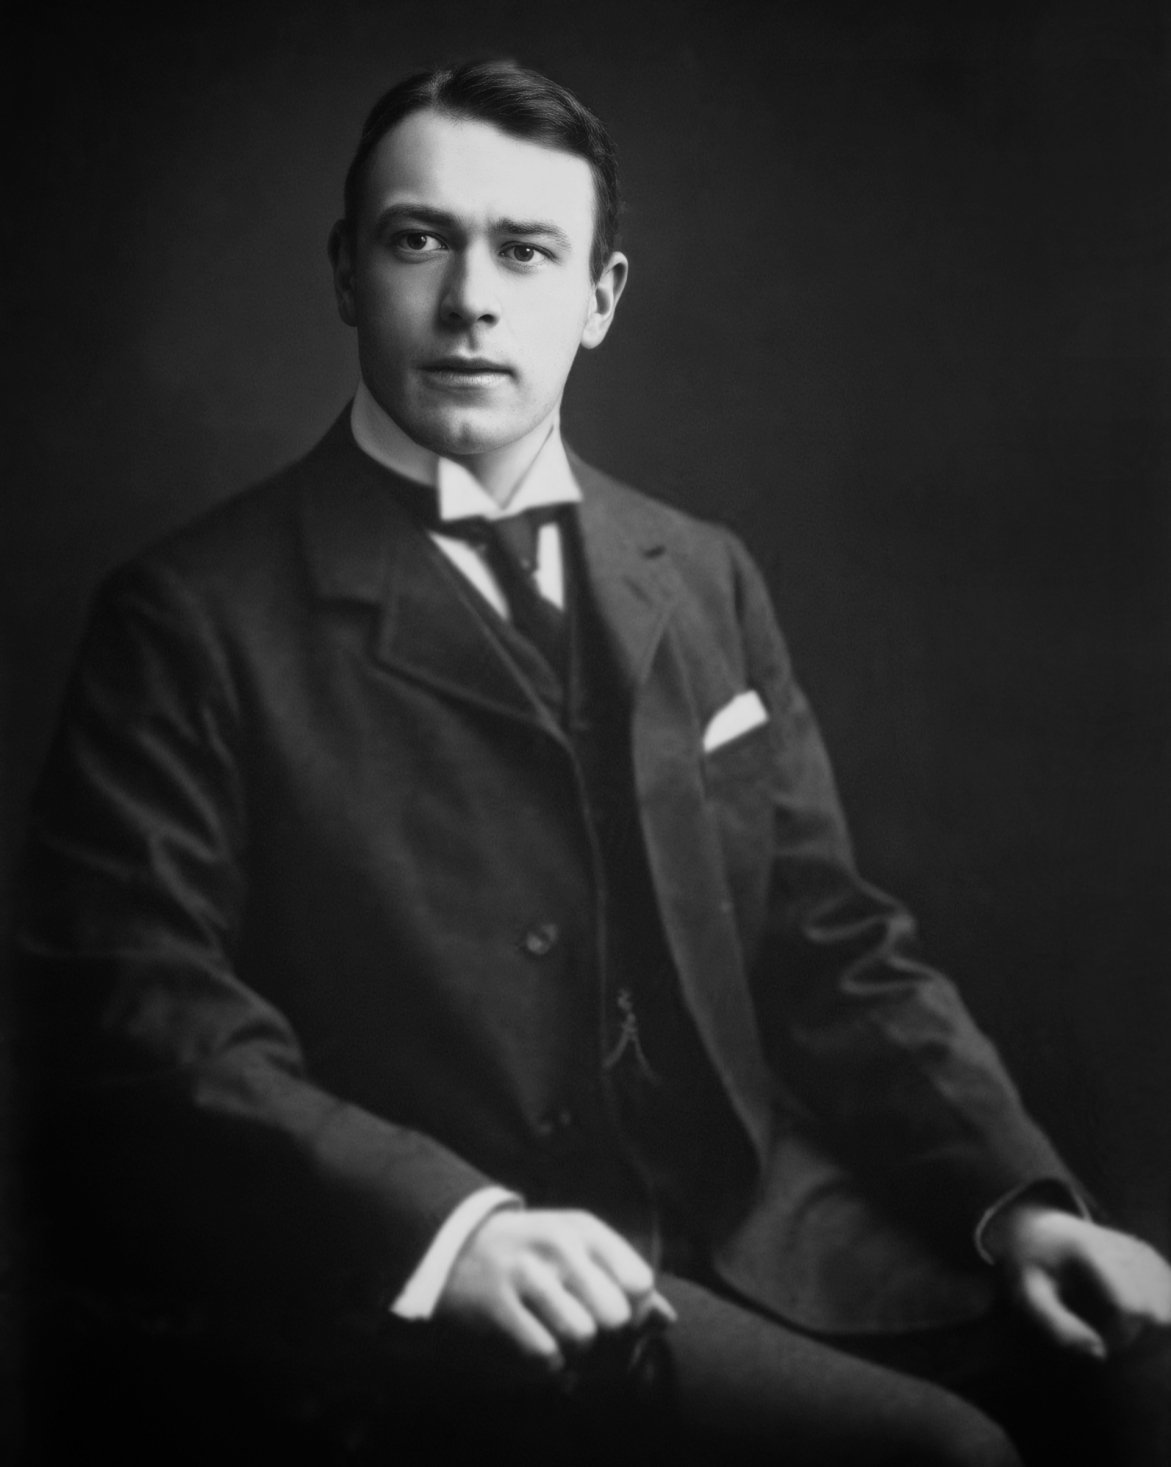 Thomas Andrews Jr. Designer of RMS Titanic